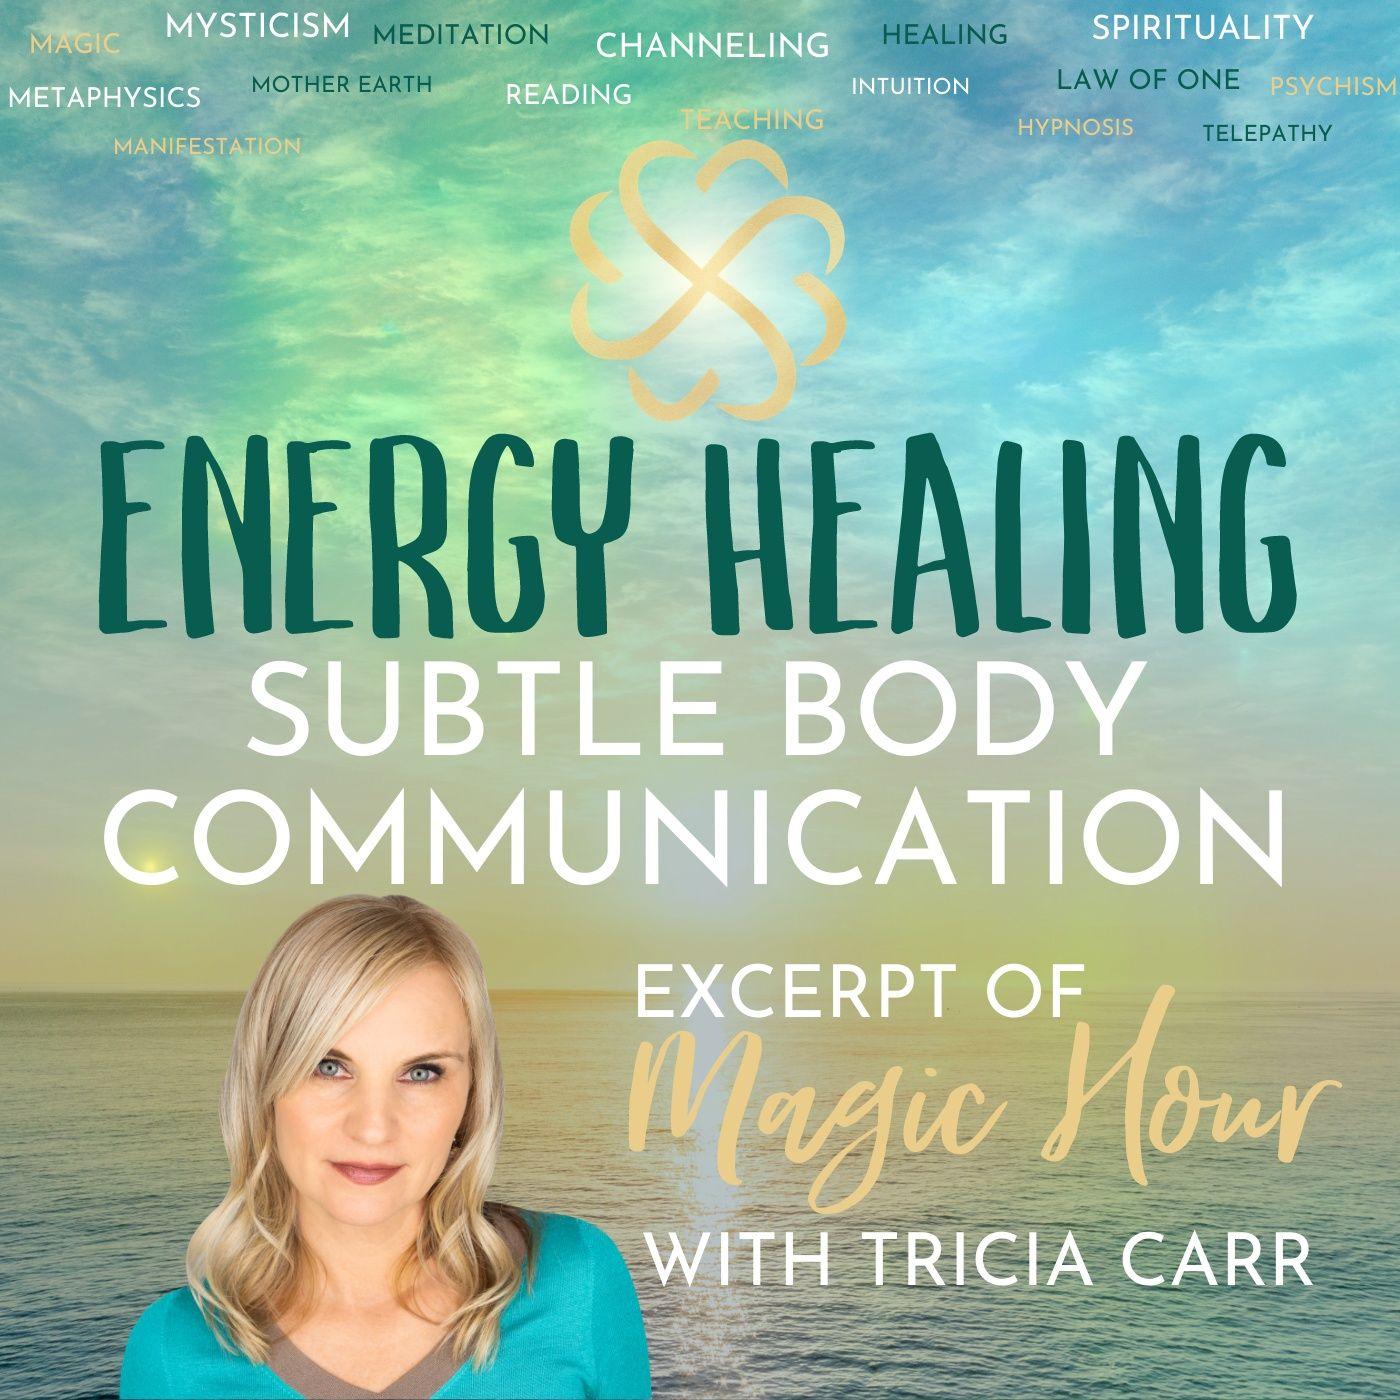 Energy [Self] Healing   Subtle Body Communication   Magic Hour Excerpt